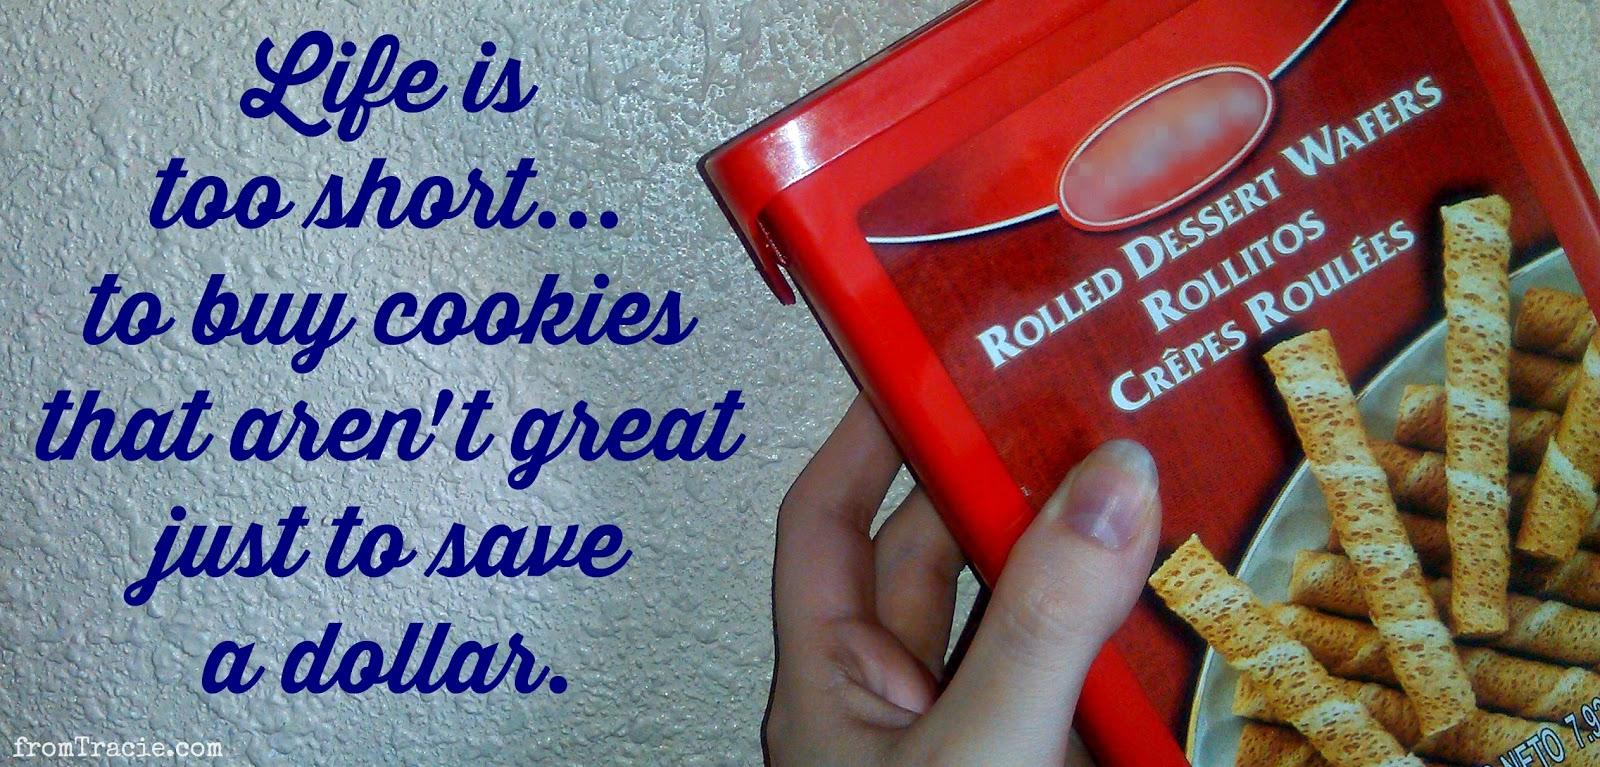 Life Is Too Short To Buy Bad Cookies